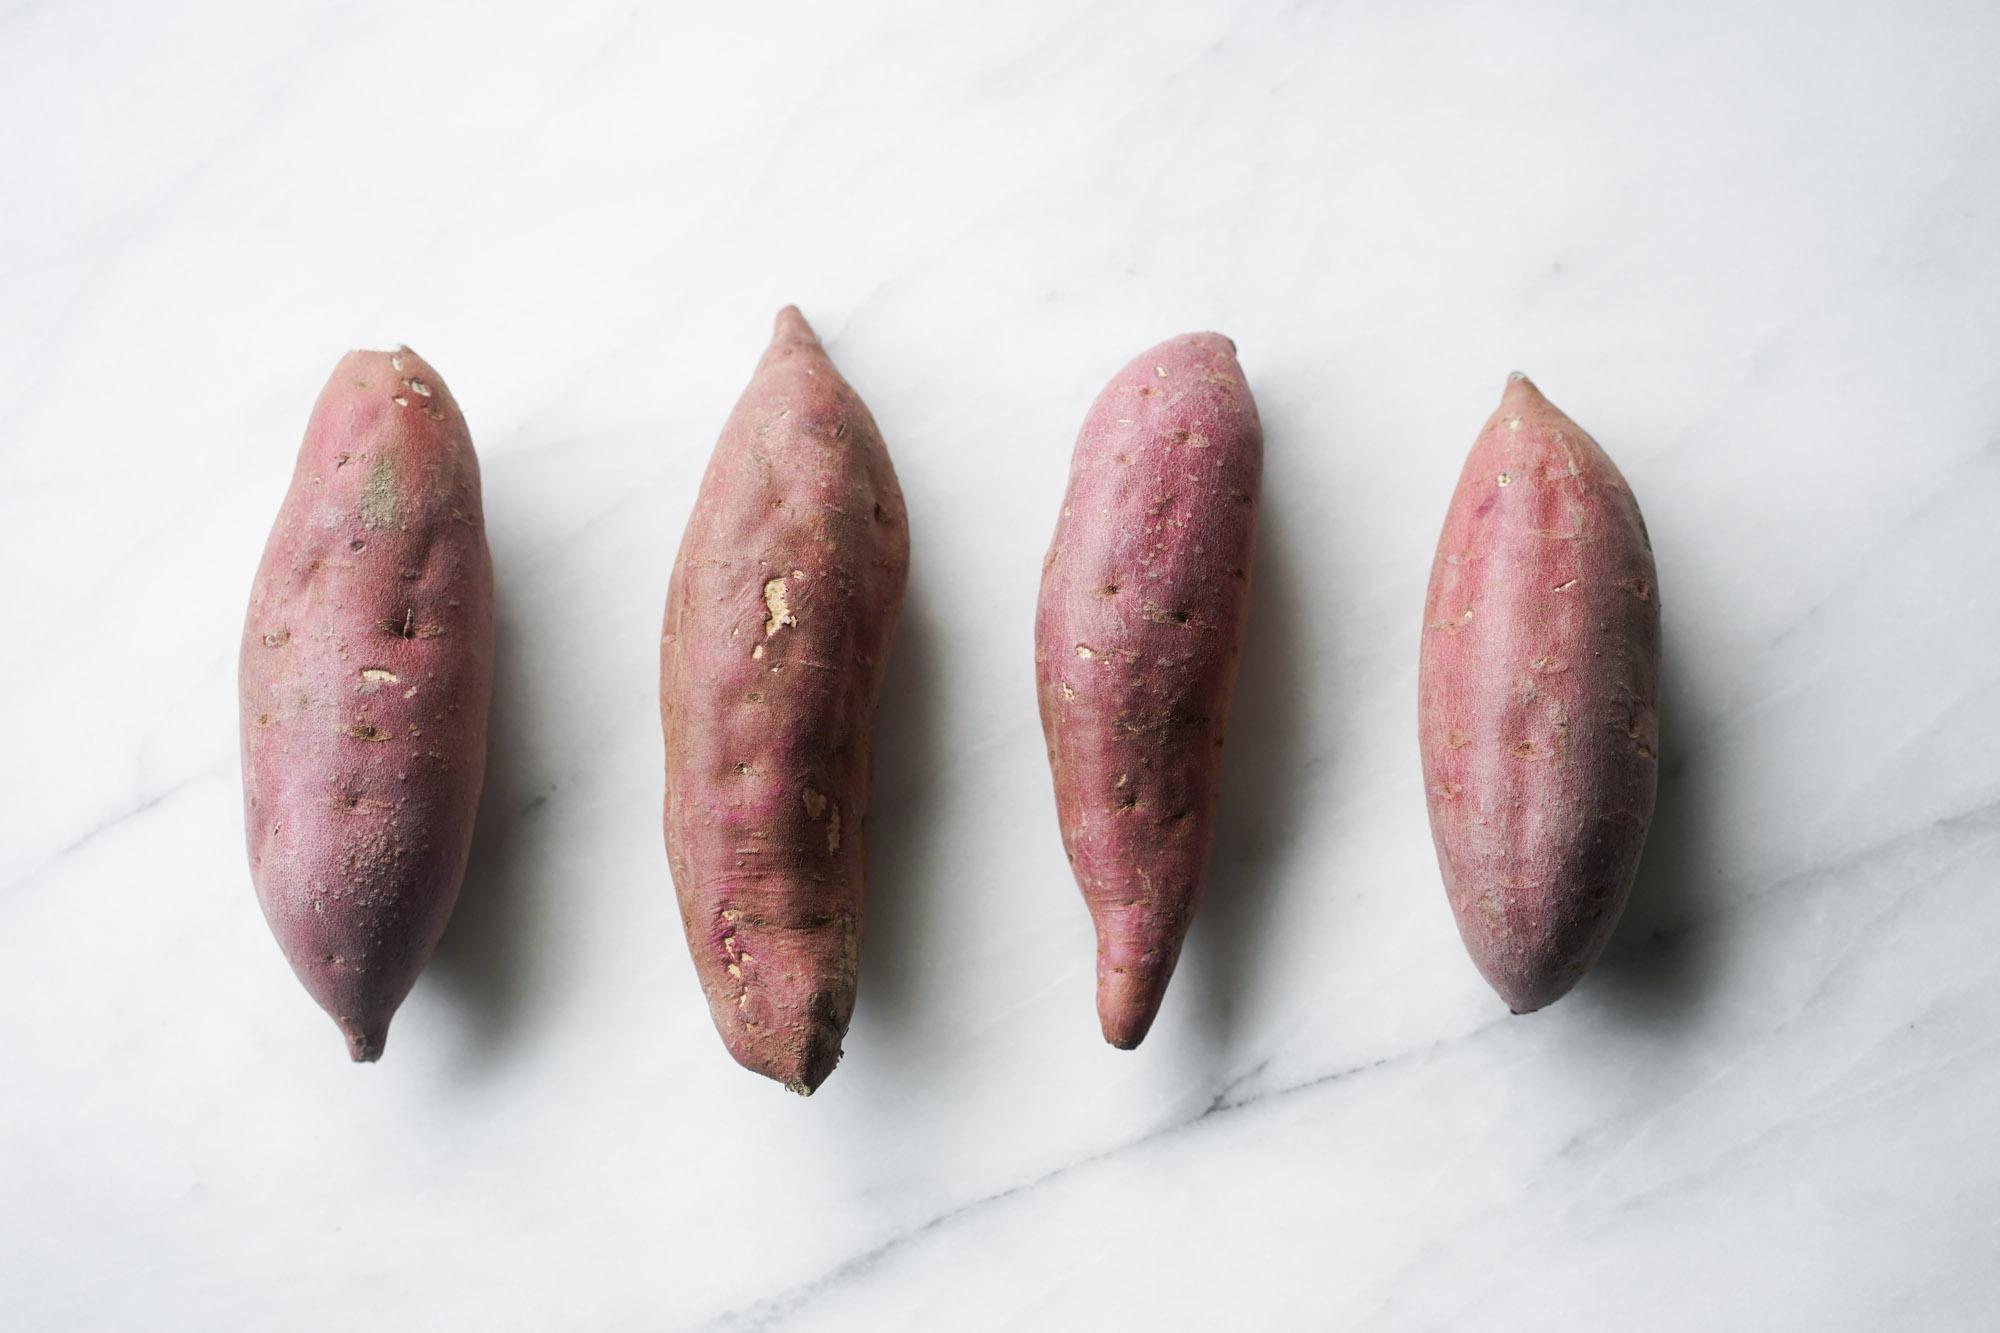 japanese sweet potatoes perfectly